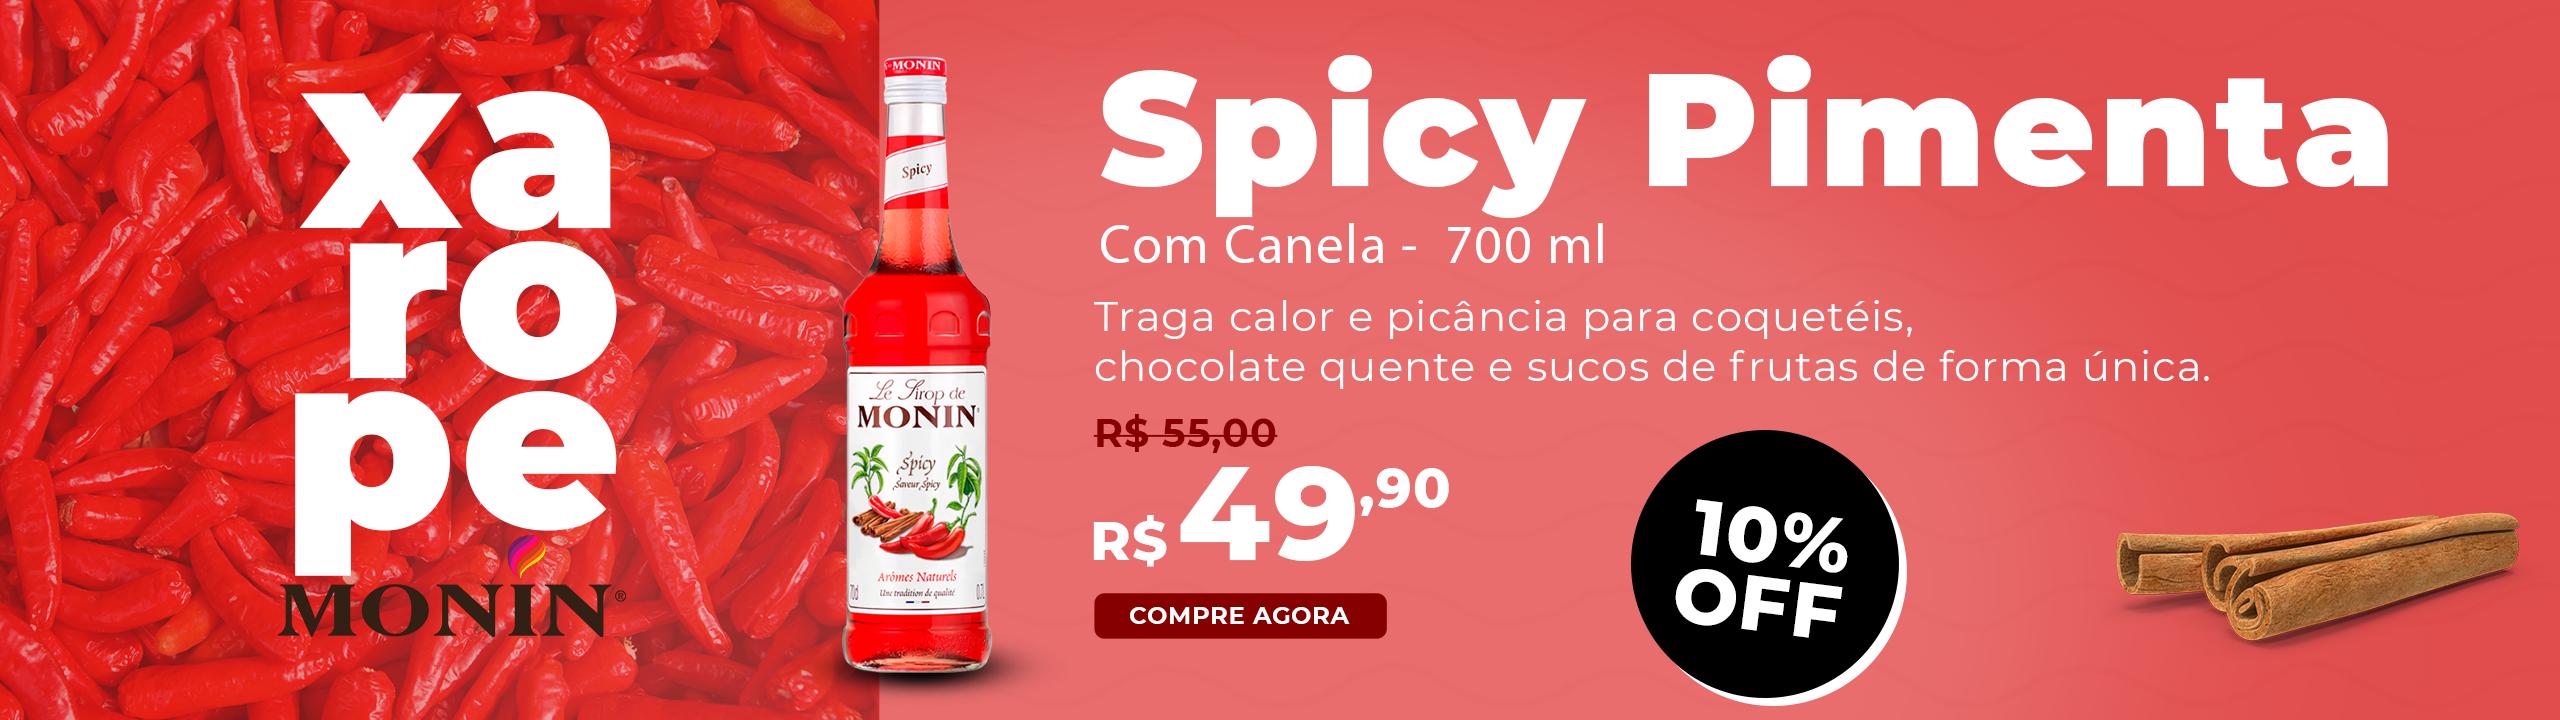 Xarope Monin Francês Spicy Pimenta 700ml